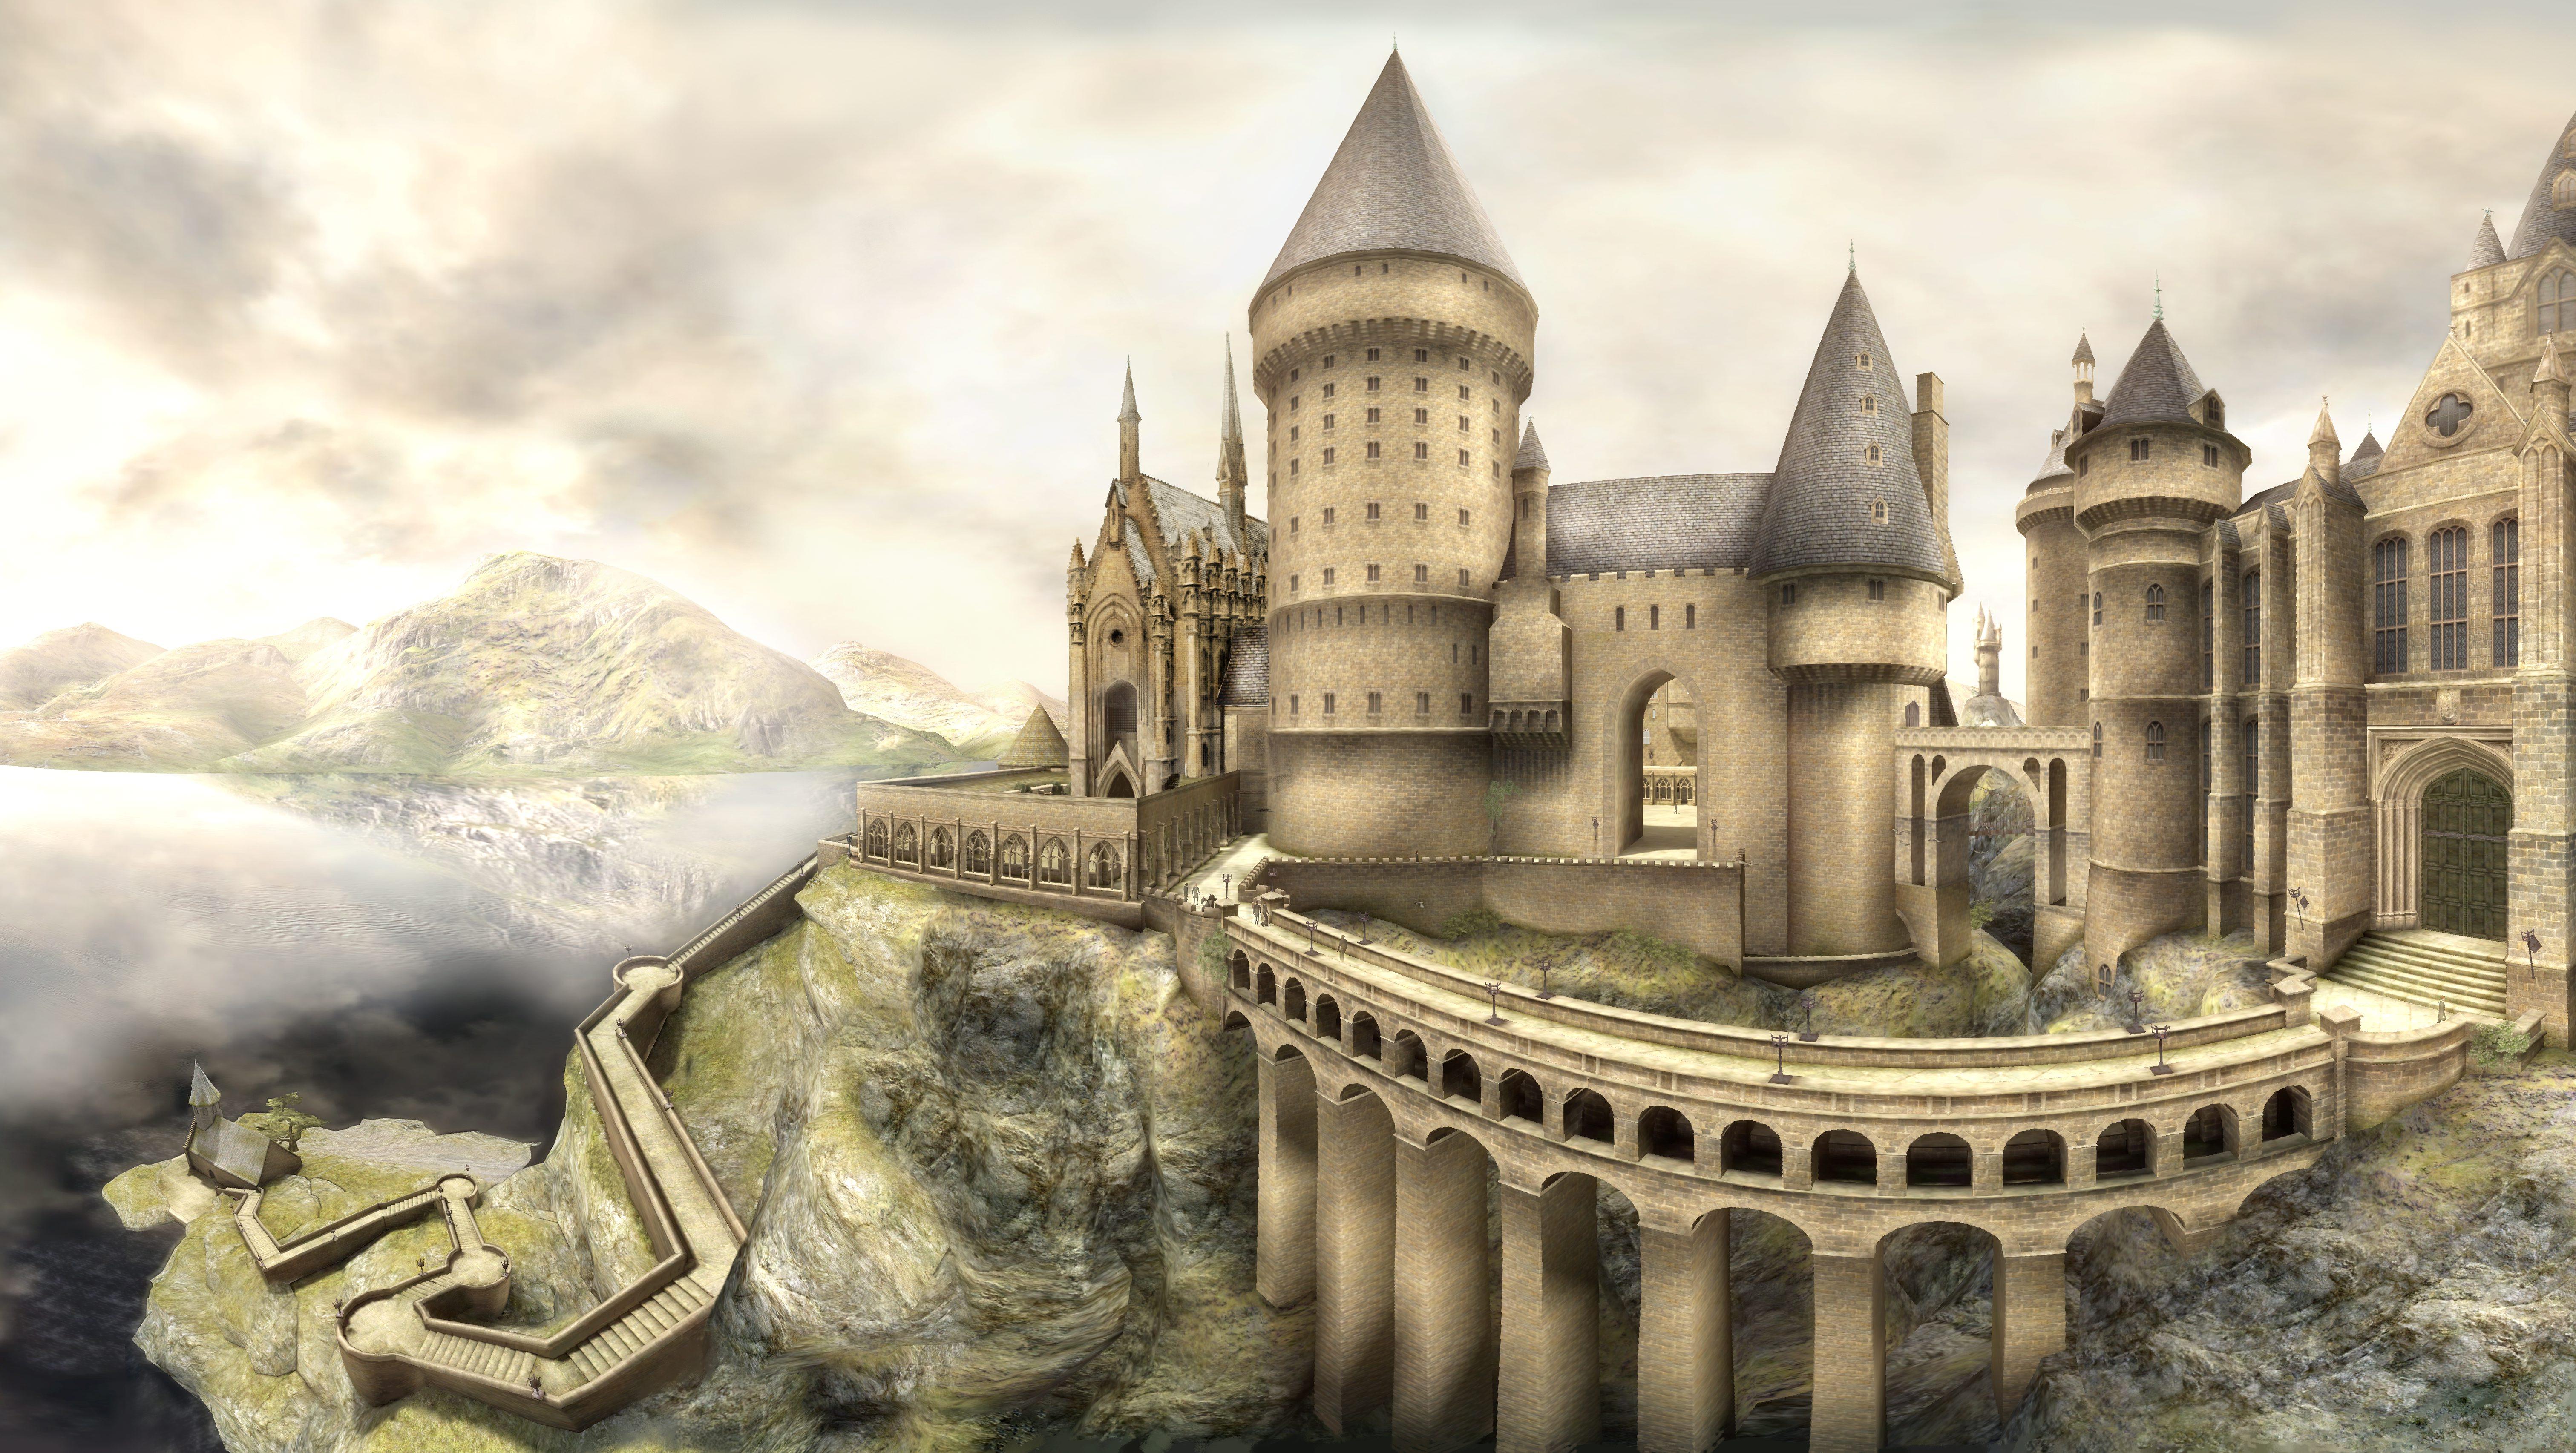 Hogwarts Castle Wallpapers Man Made Hq Hogwarts Castle Pictures